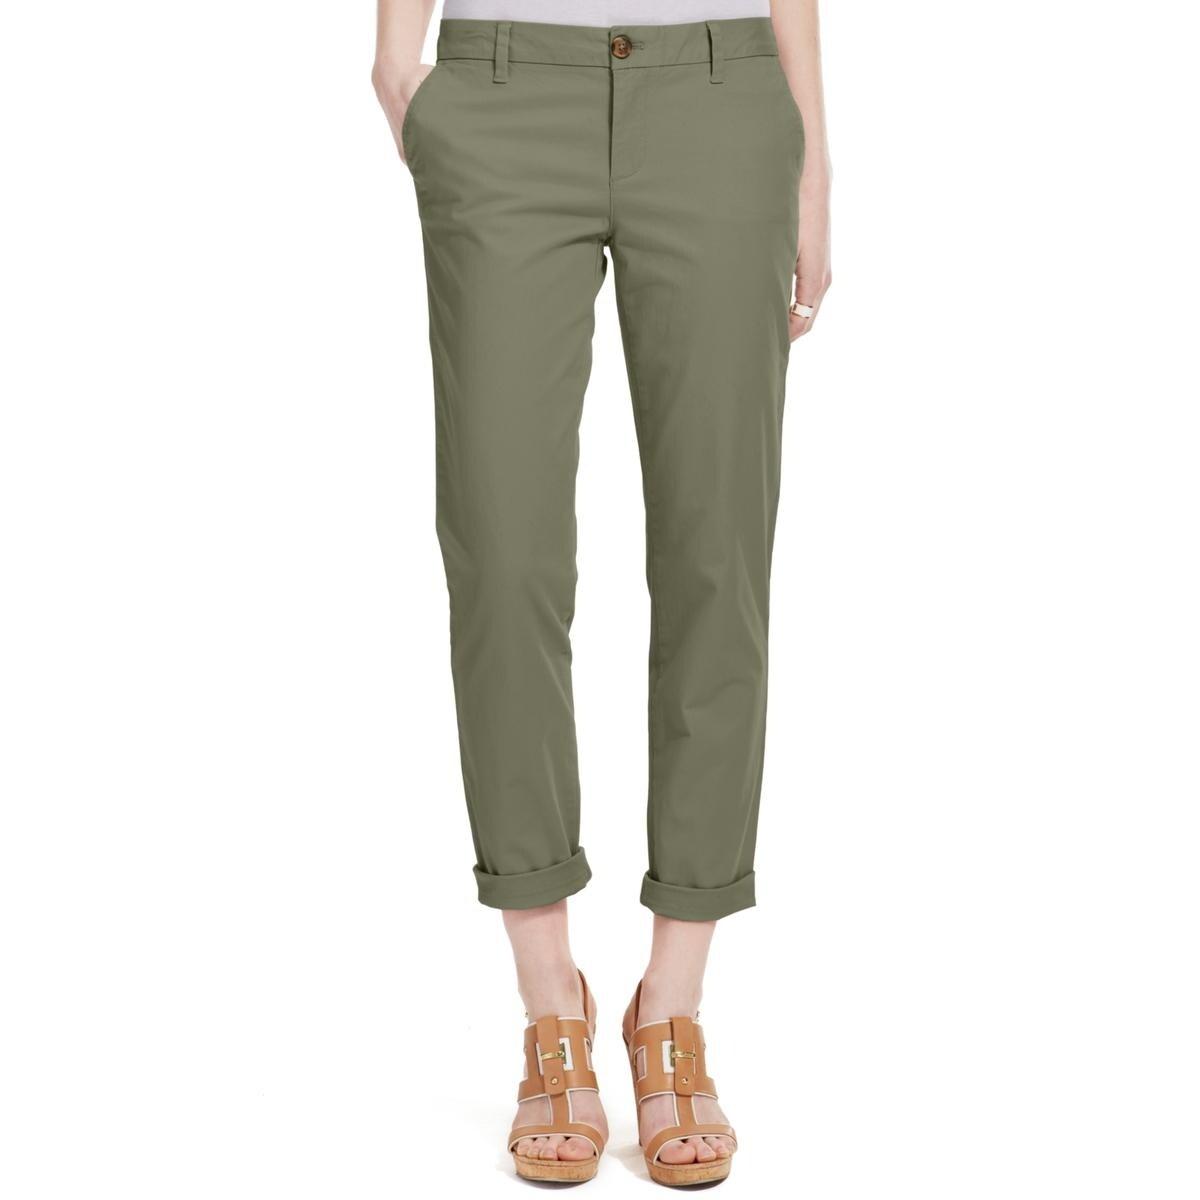 d7ae09f52 Shop Tommy Hilfiger Womens Hampton Chino Pants Casual Slim Fit ...